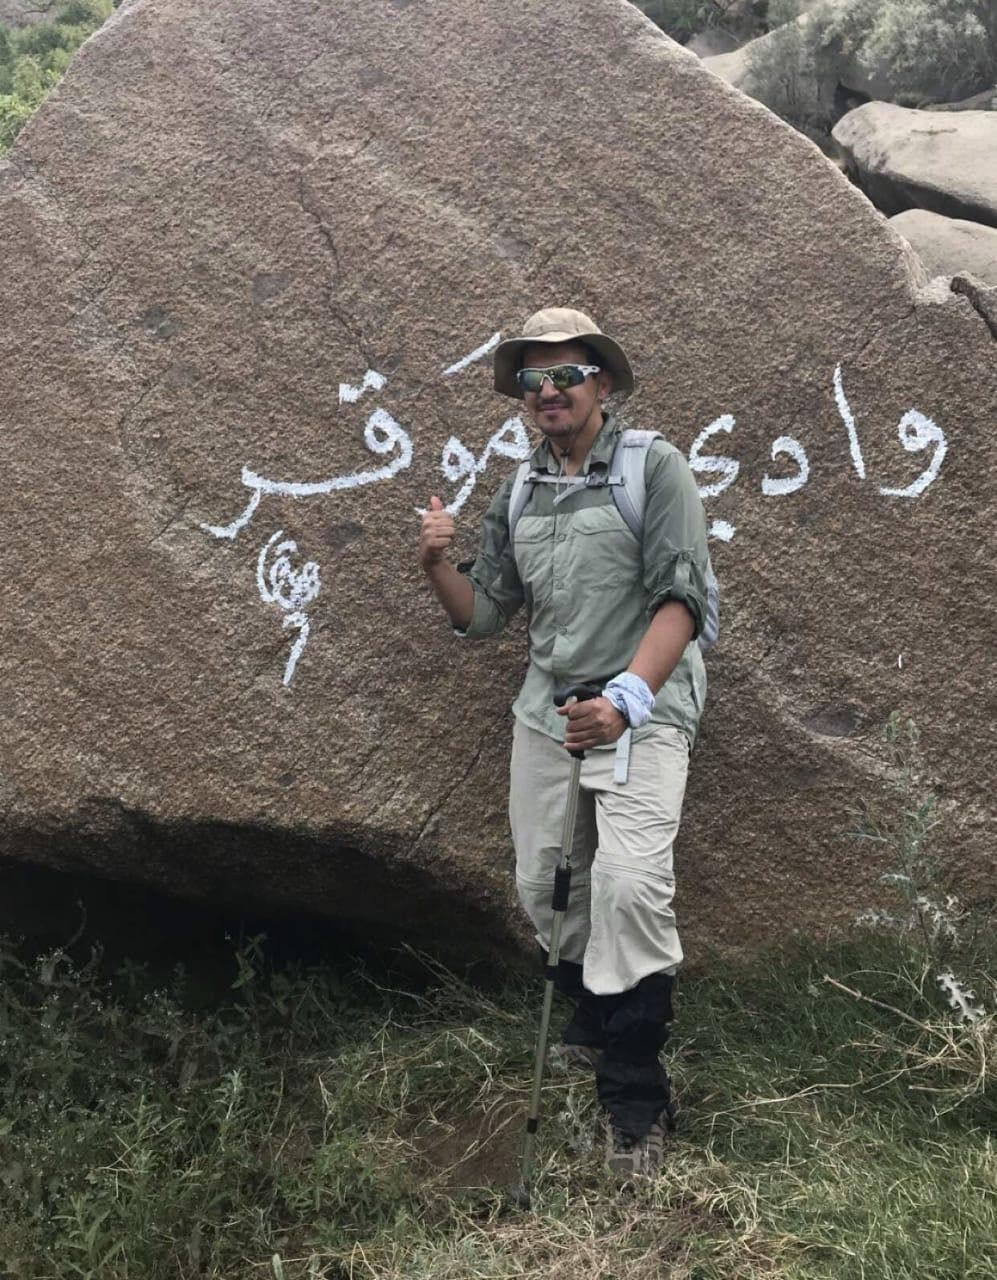 KSA: Hiking